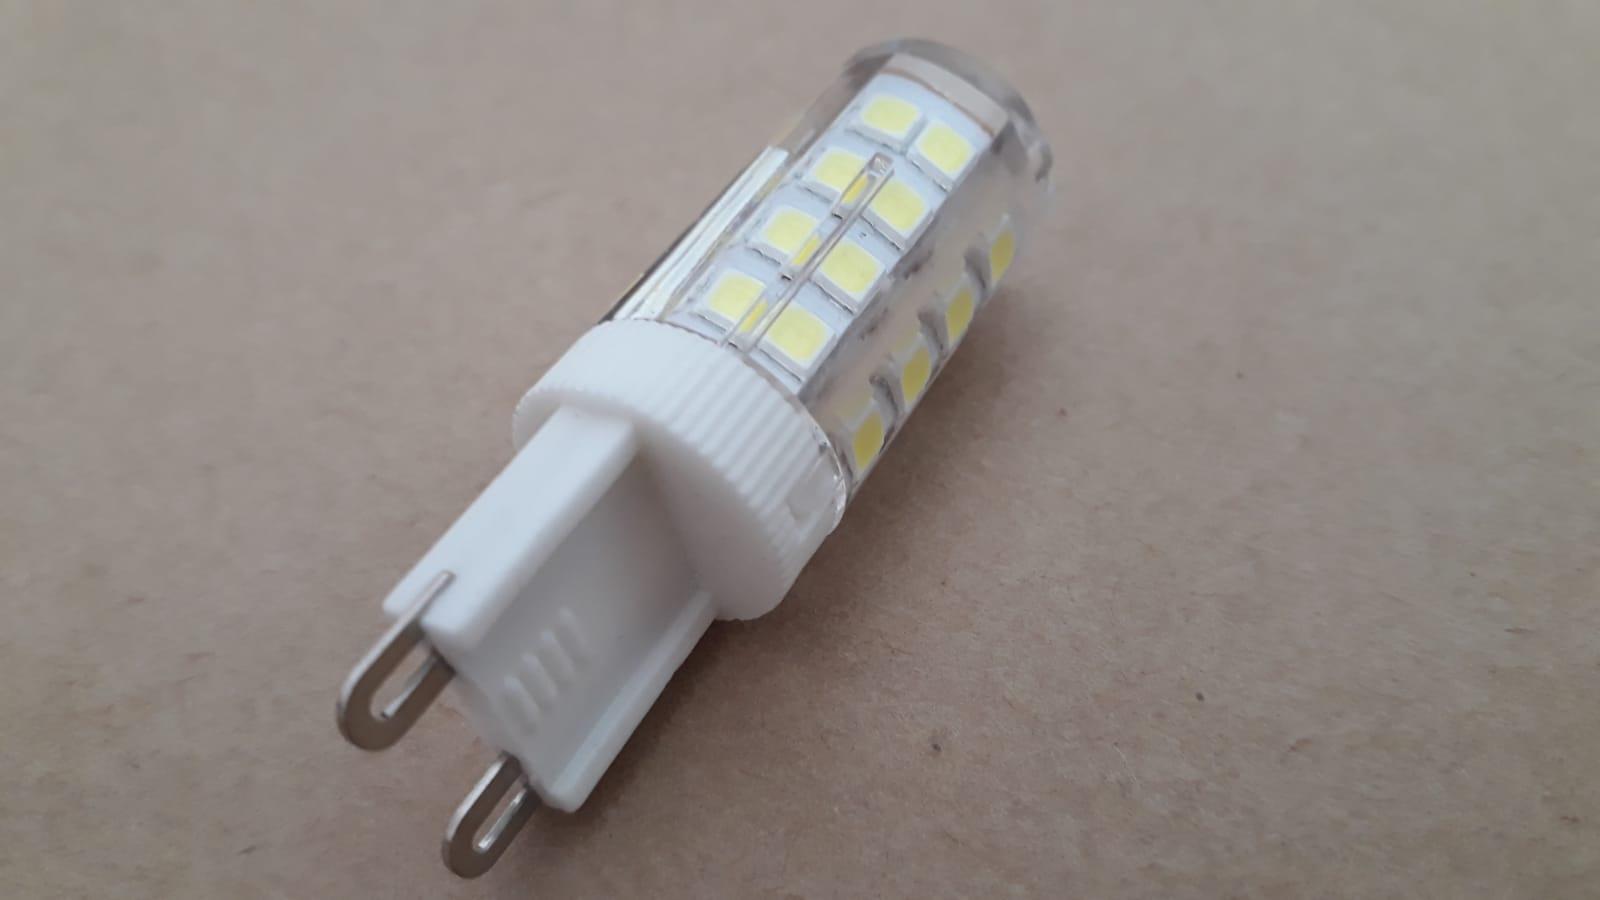 Lampada LED G9 5w 6000k Bivolt Bipino Halopin Branco Frio Encapsulada  - OUTLED ILUMINAÇÃO